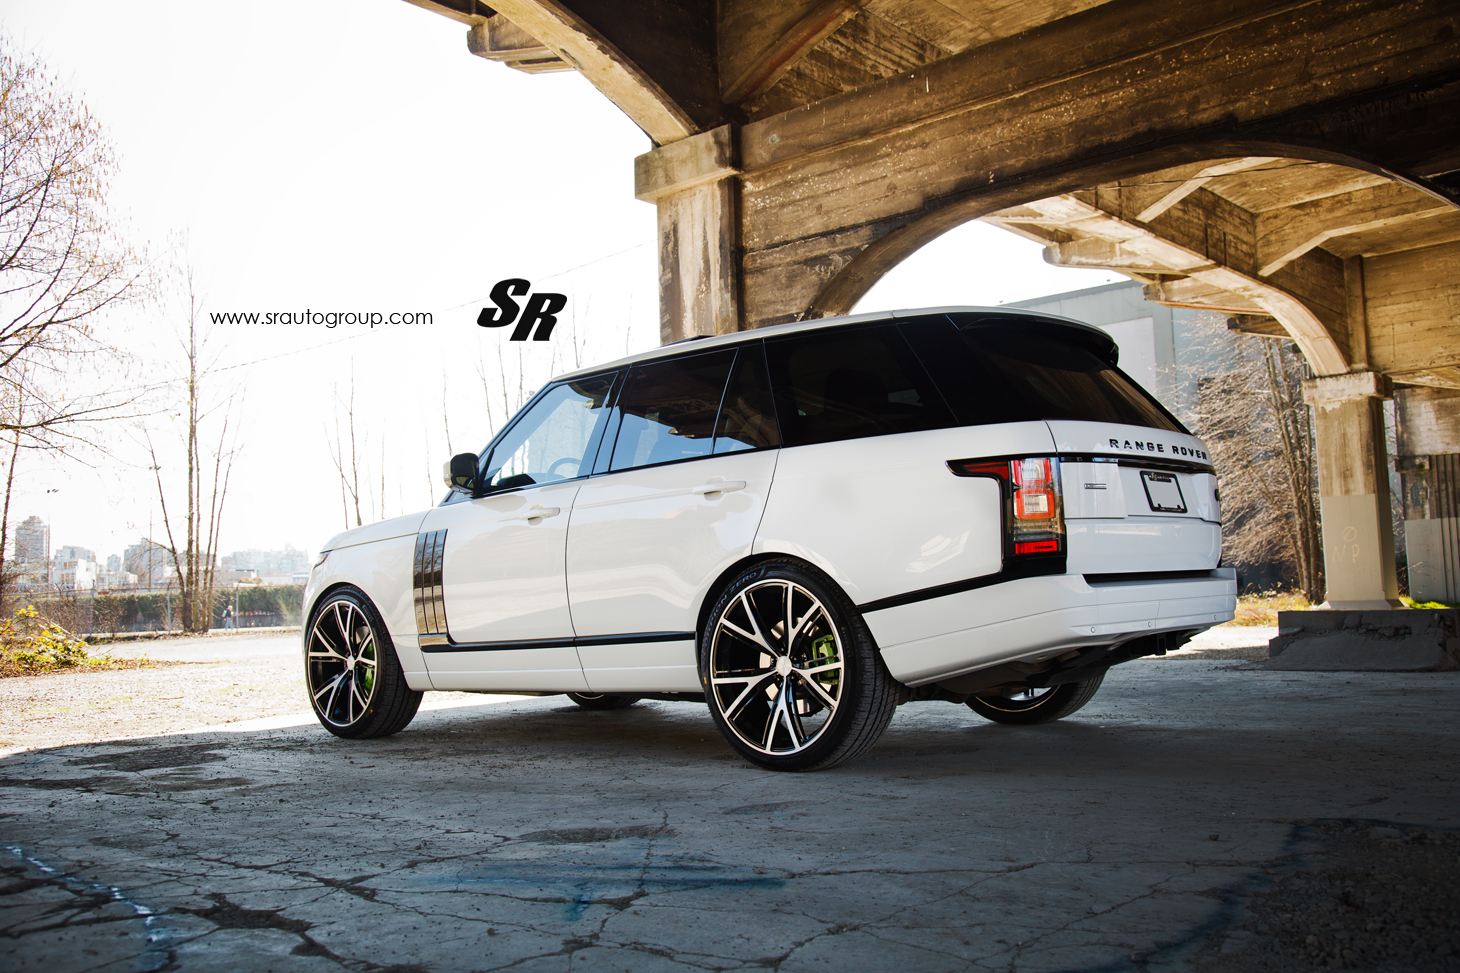 2013 Range Rover Gets PUR Wheels, Lambo-Green Calipers ...